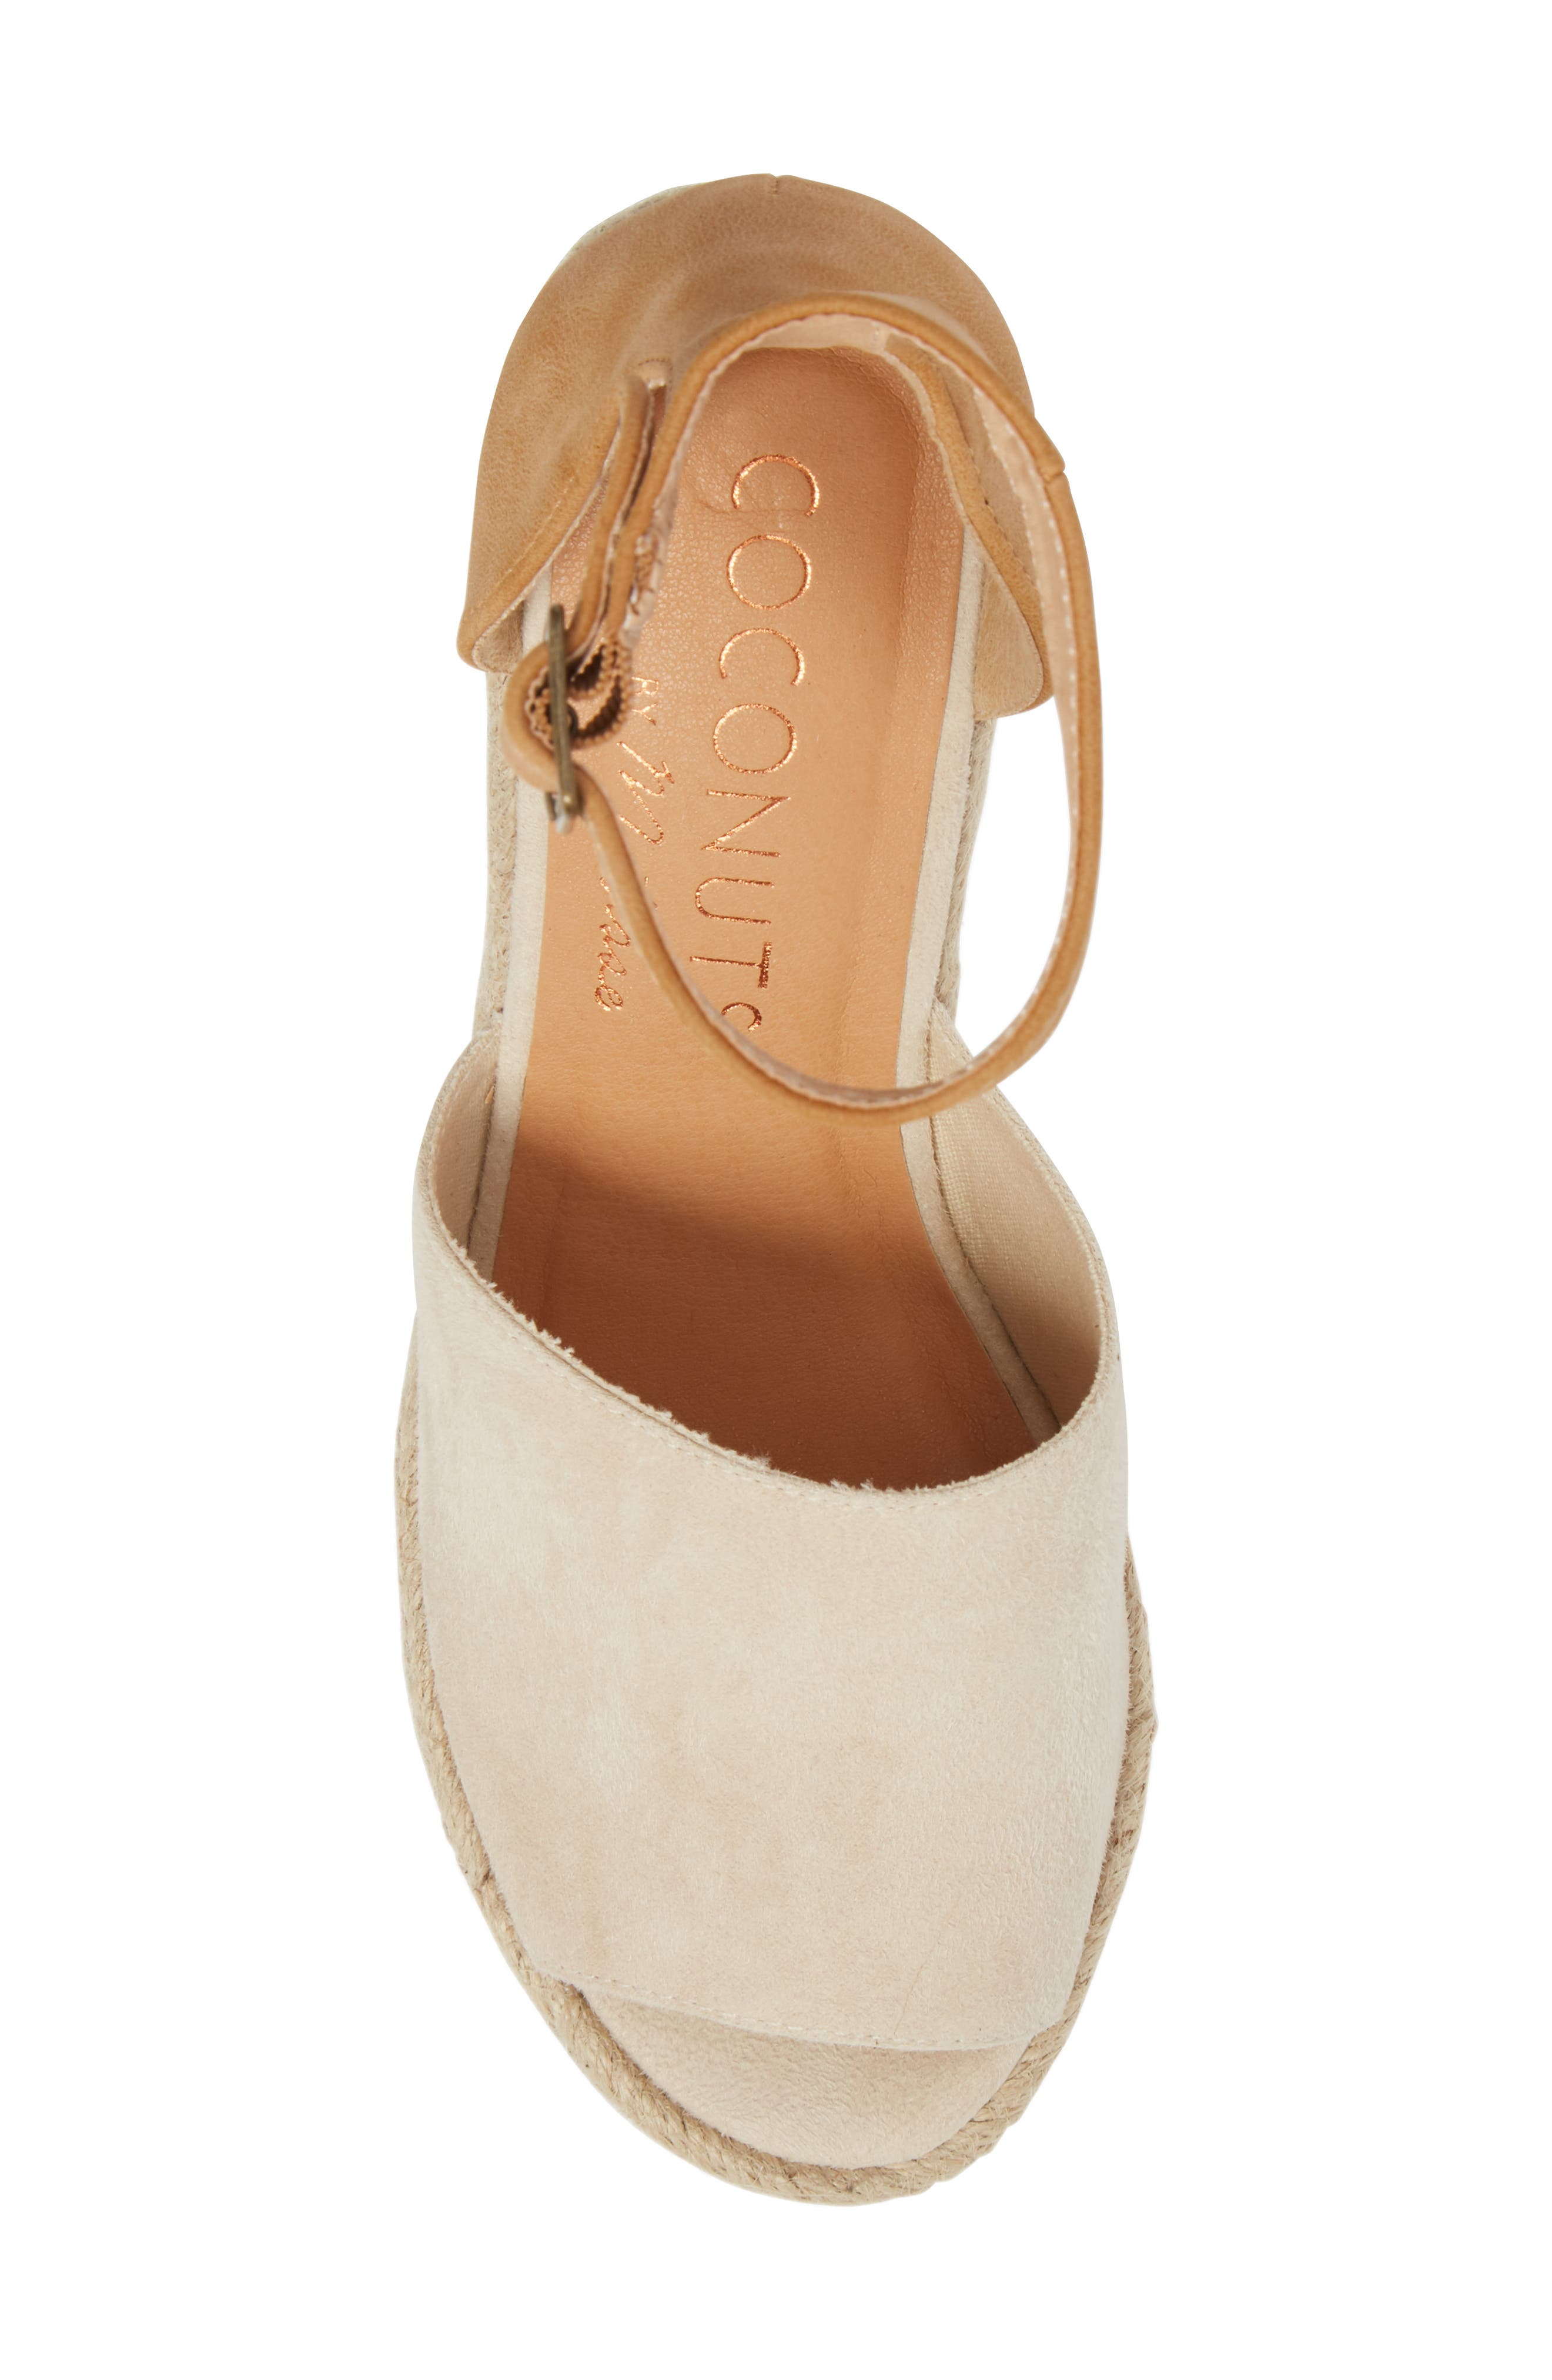 Flamingo Wedge Sandal,                             Alternate thumbnail 5, color,                             Natural Suede